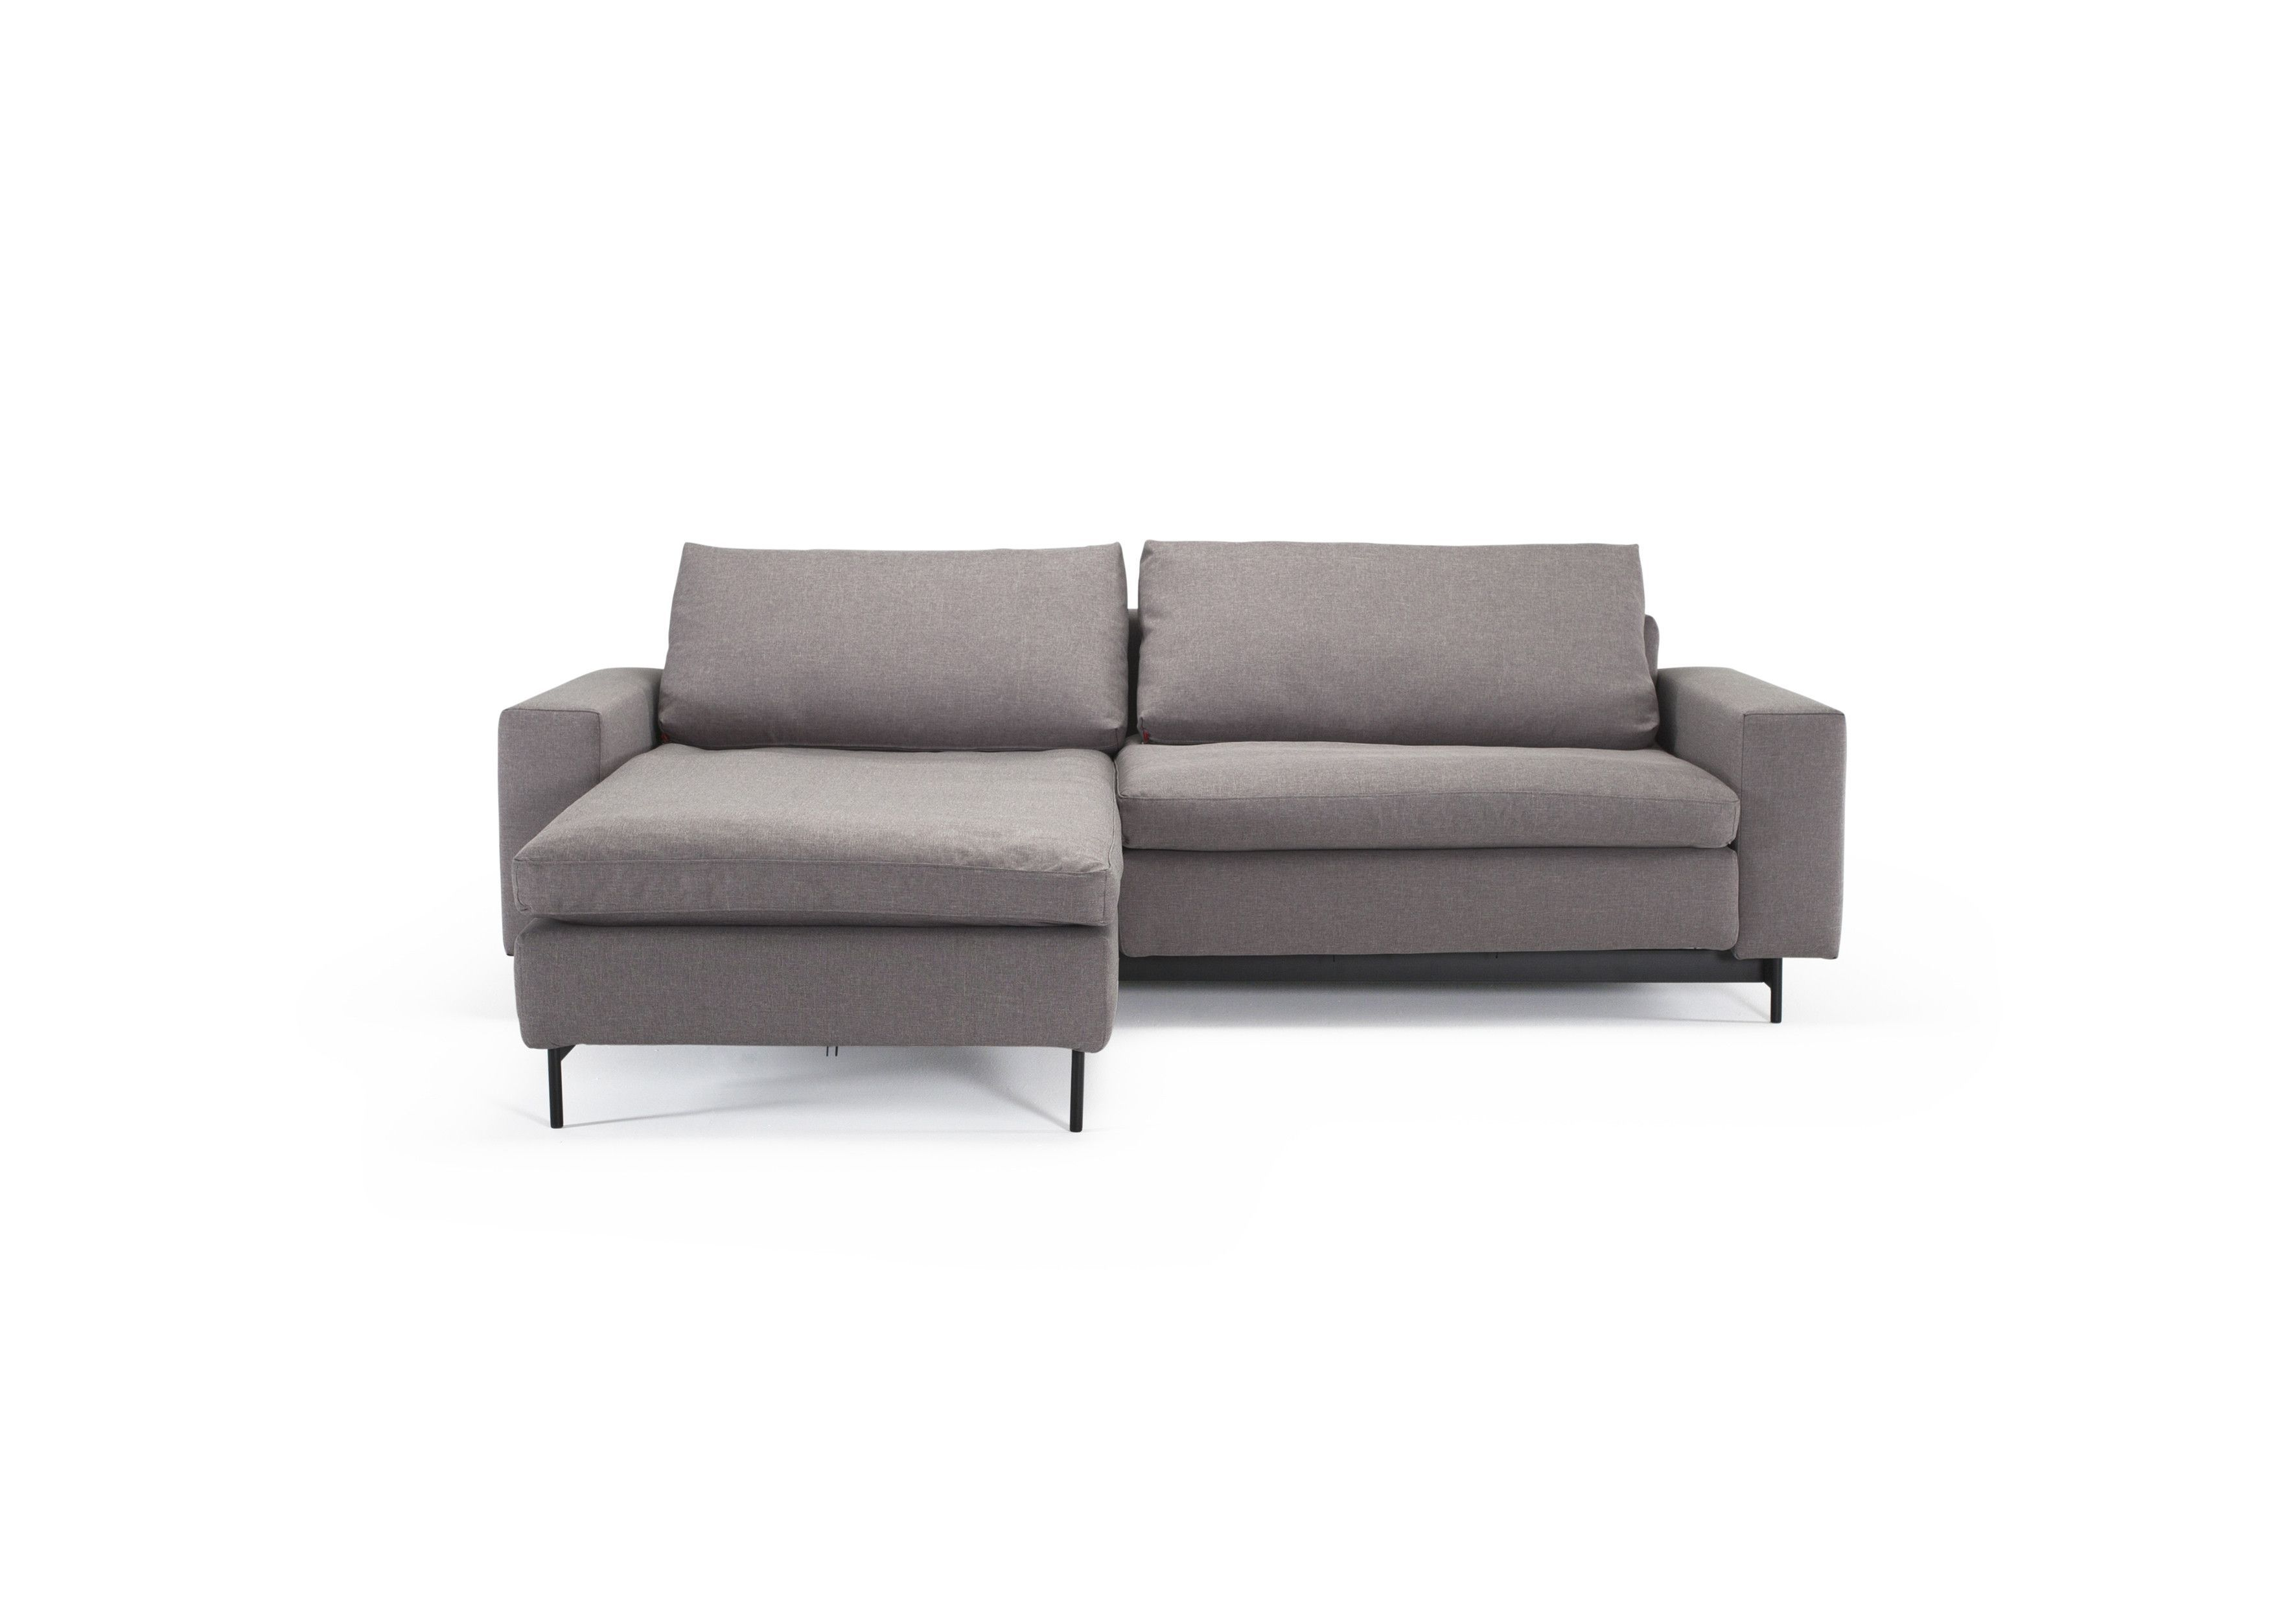 Idi Sleeper Sofa With Arms